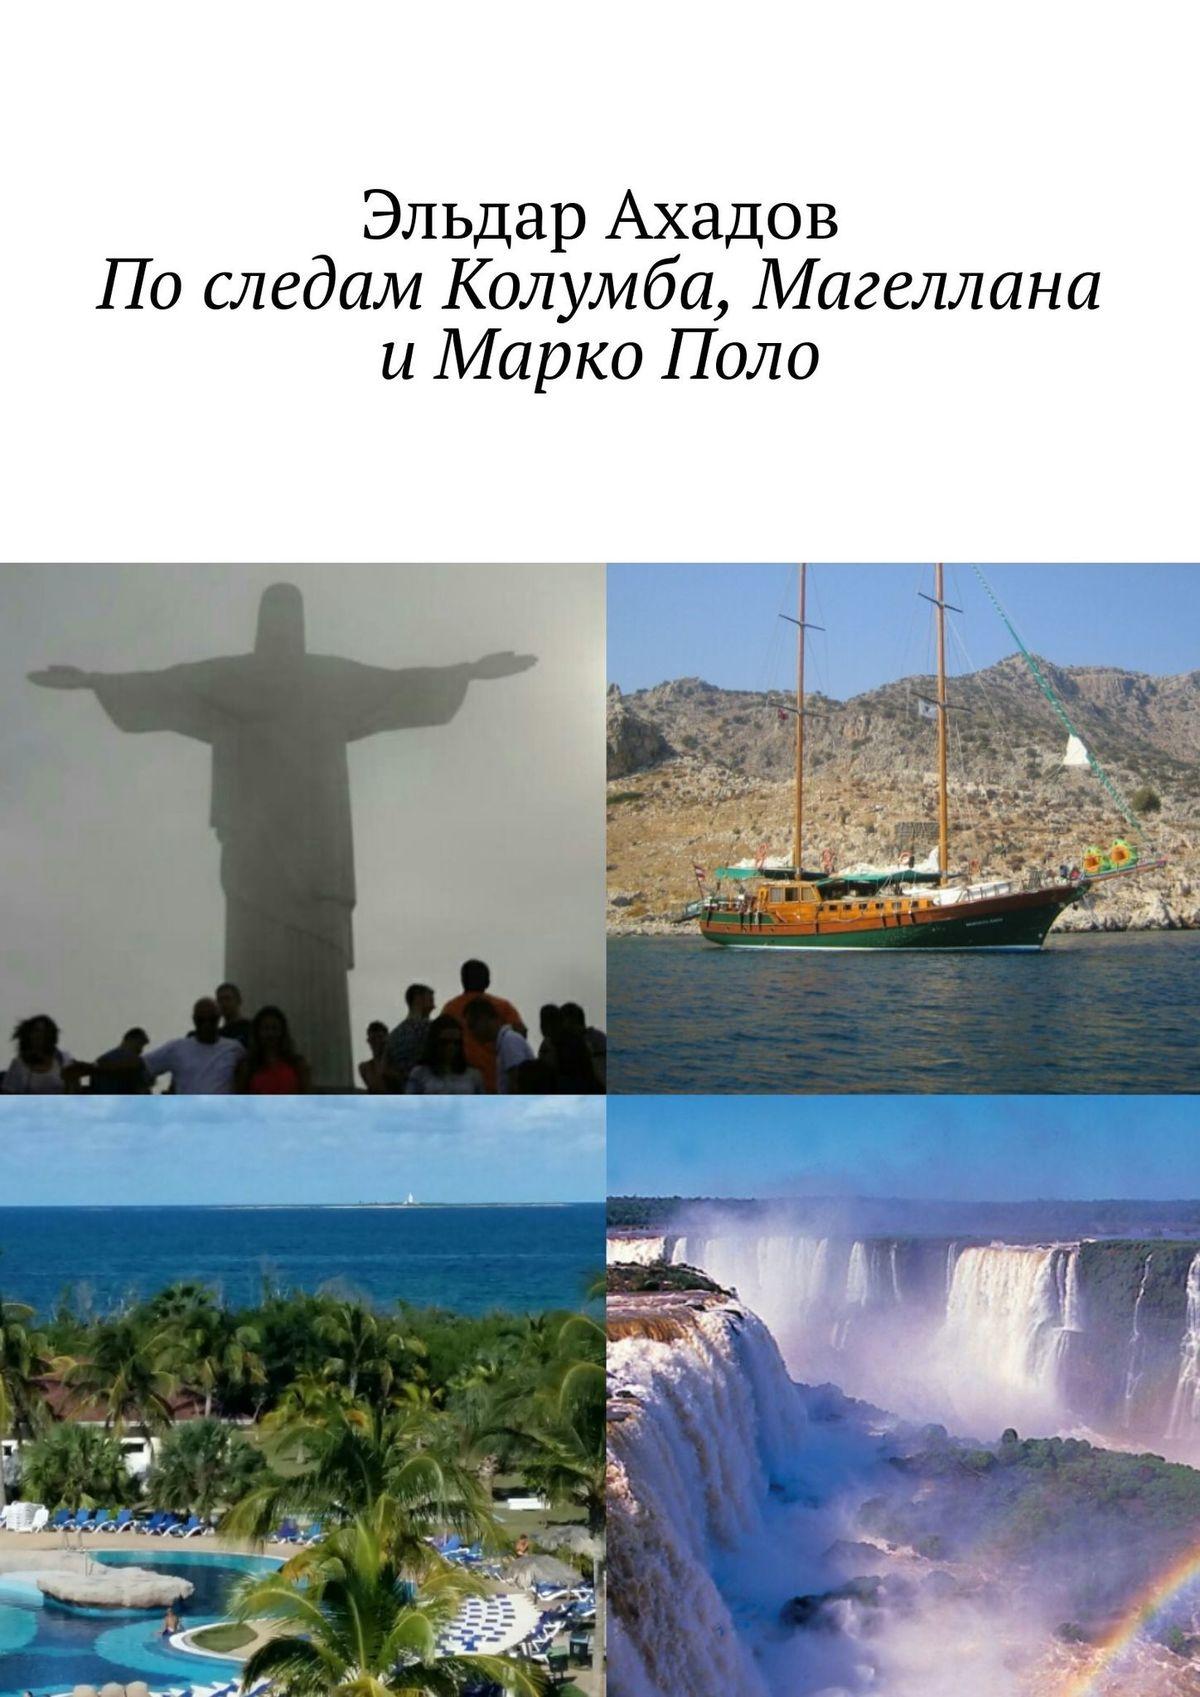 Эльдар Ахадов Последам Колумба, Магеллана иМаркоПоло